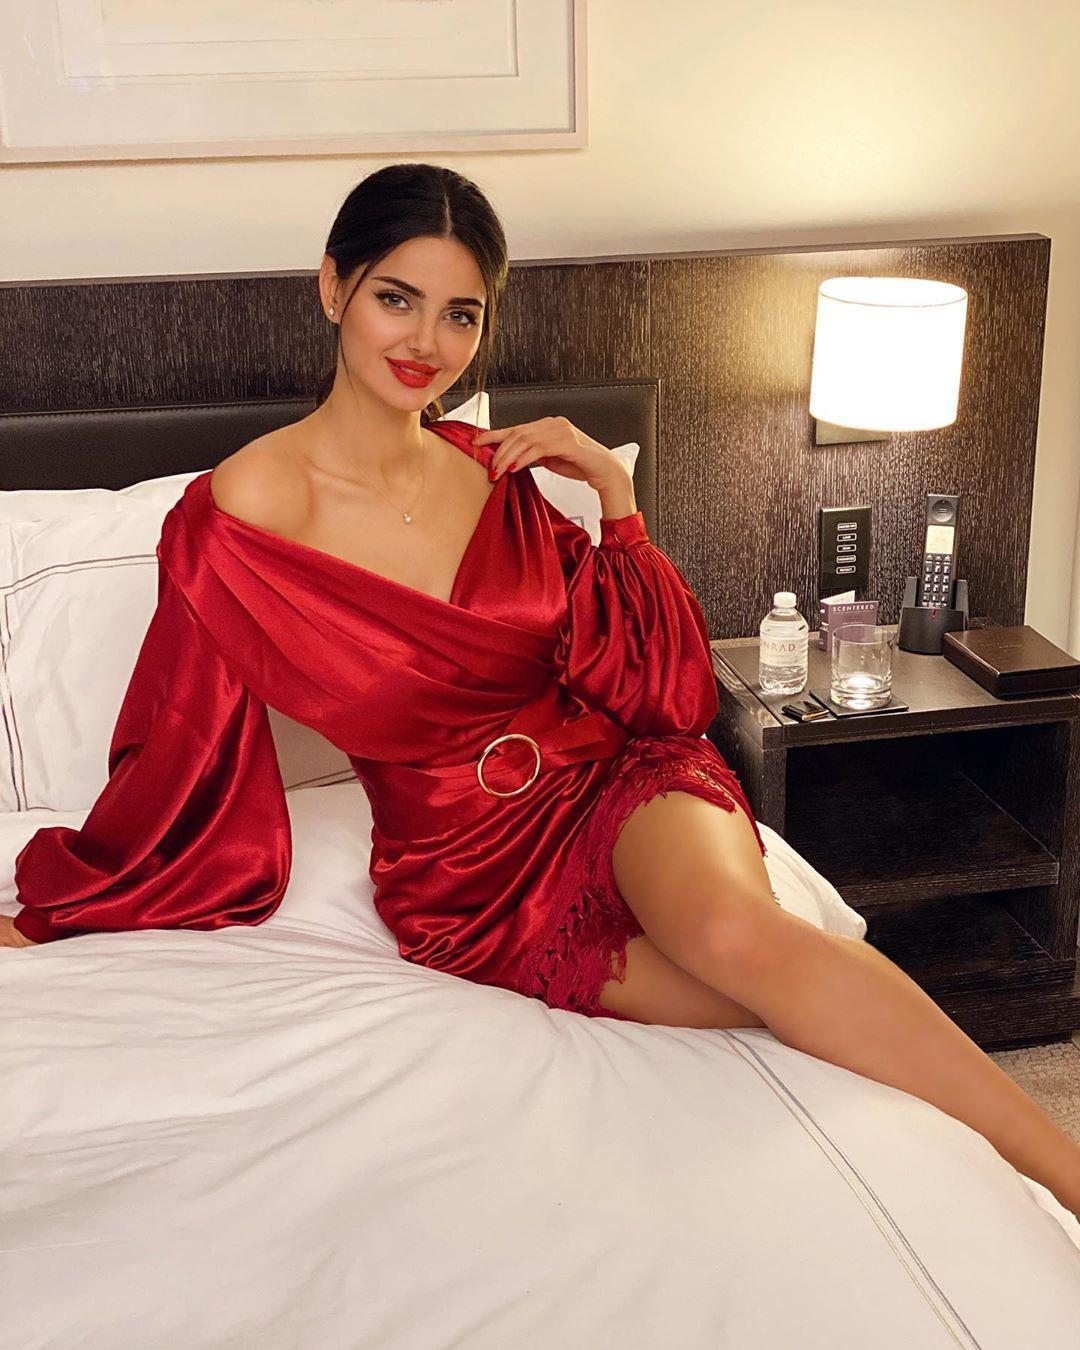 Mahlagha Jaberi dress, gown nightwear, silk dress for girls